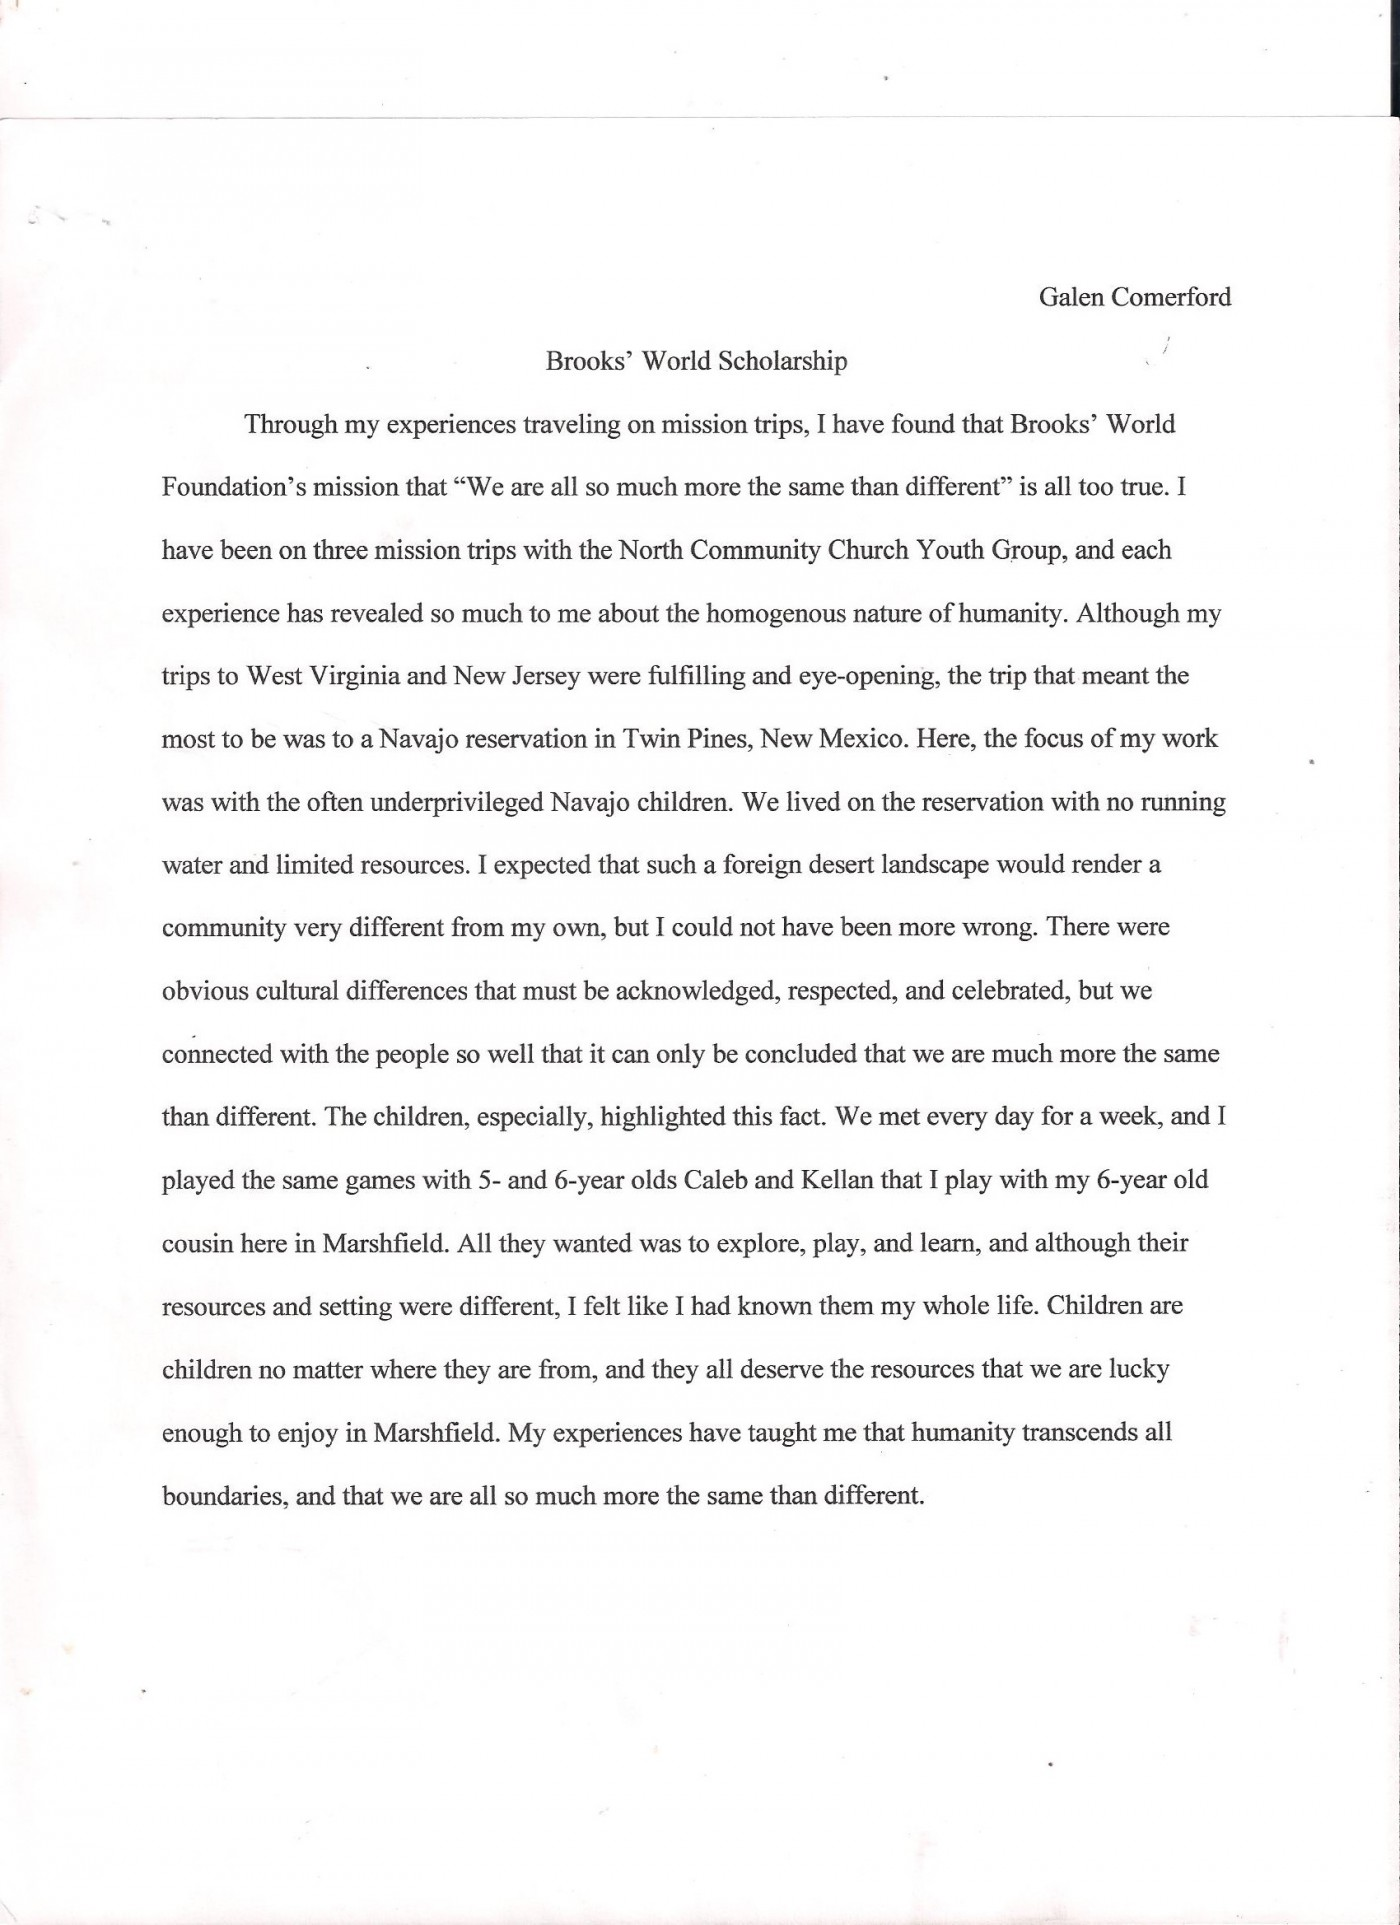 Personal essays on divorce